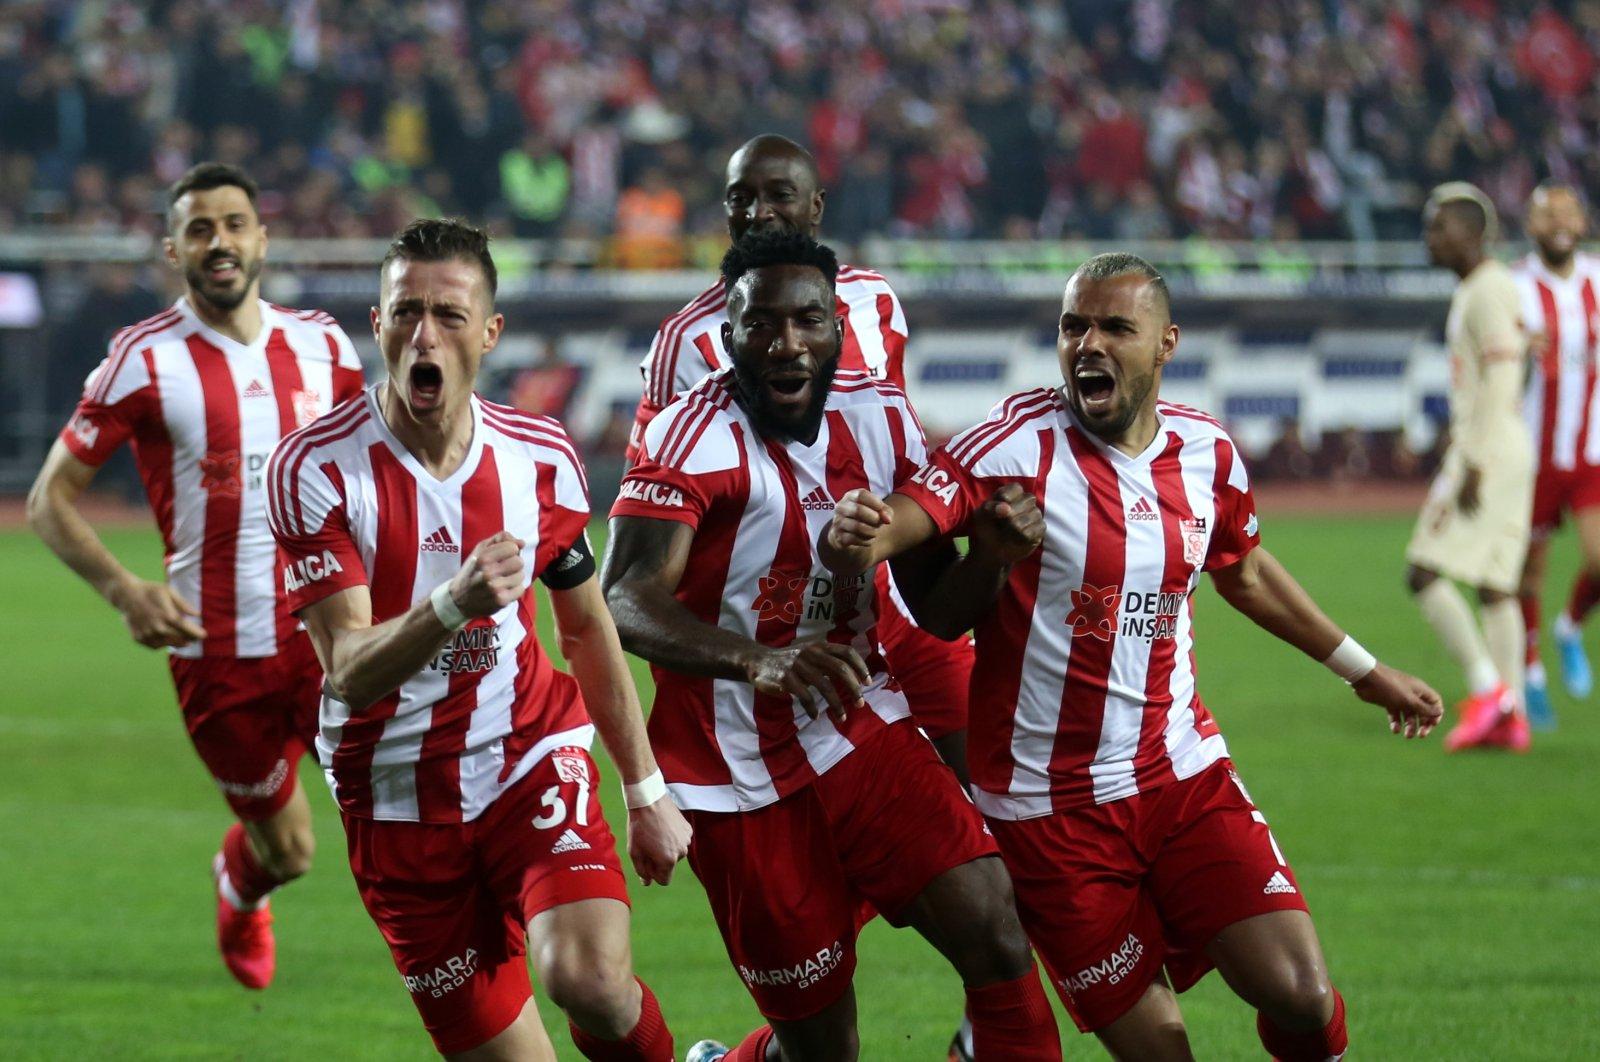 Sivasspor players celebrate a goal during a Süper Lig match in Sivas, Turkey, March 8, 2020. (AA Photo)